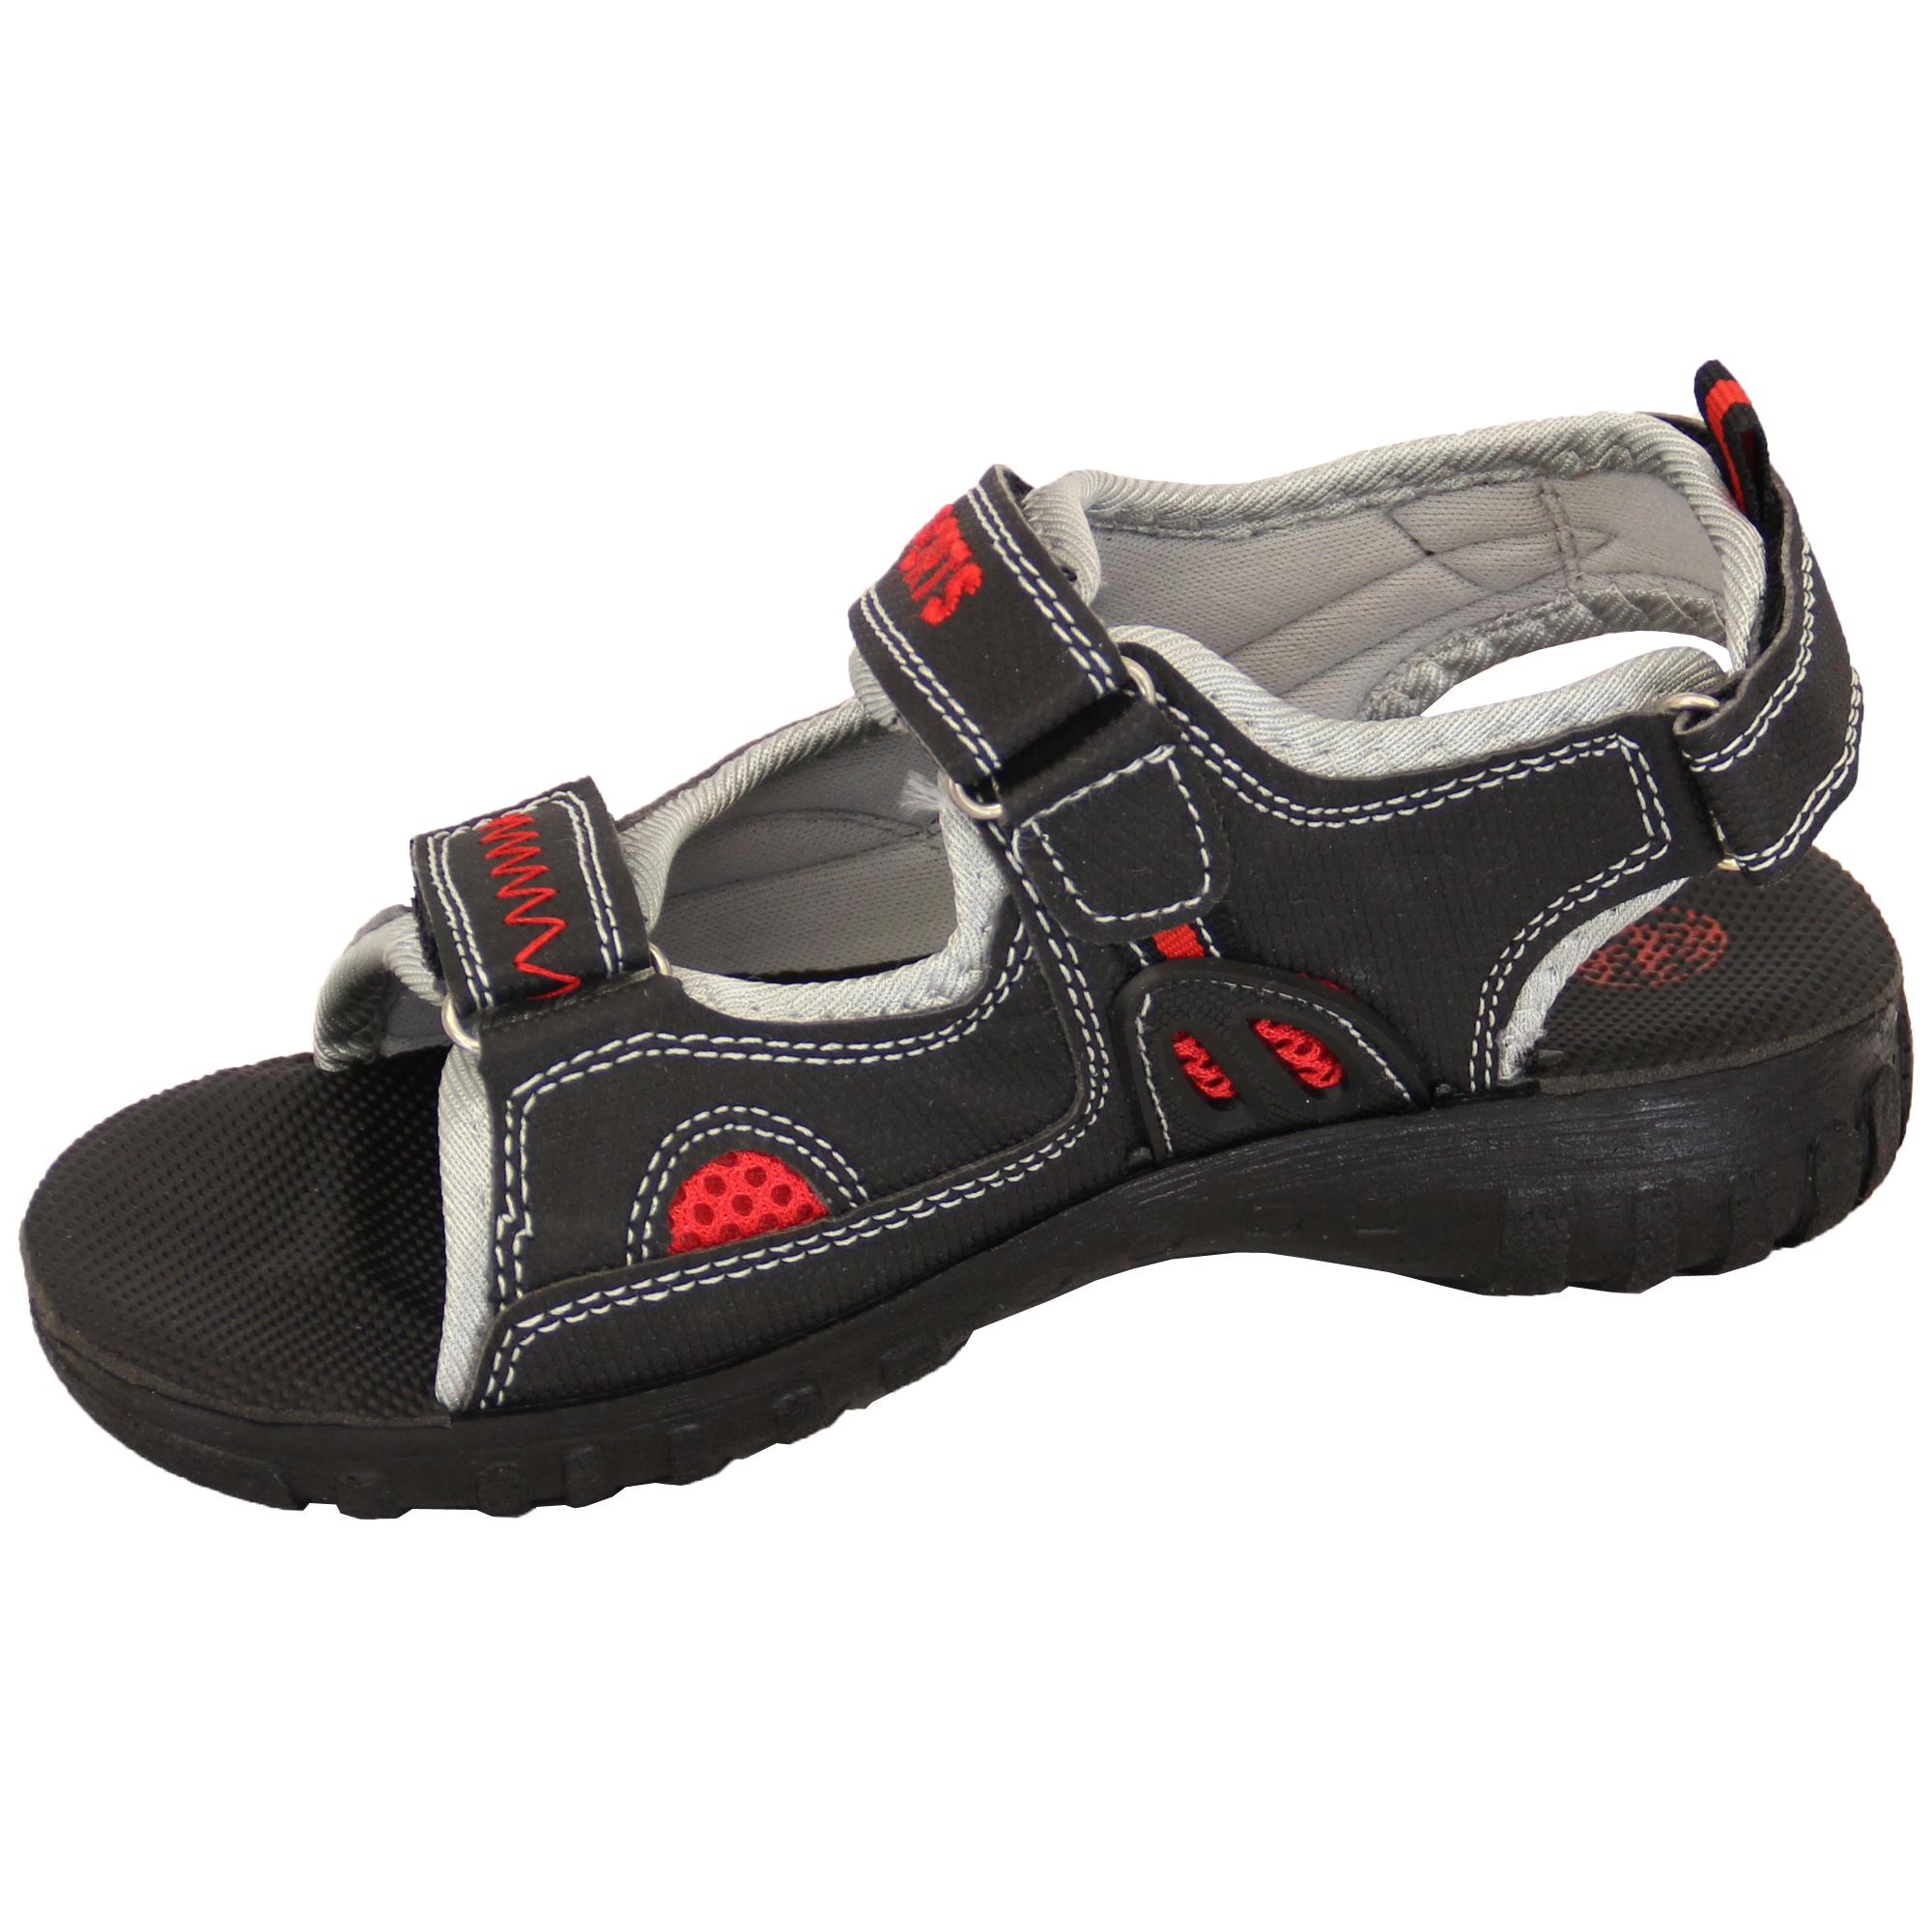 Open Toe Hiking Shoes